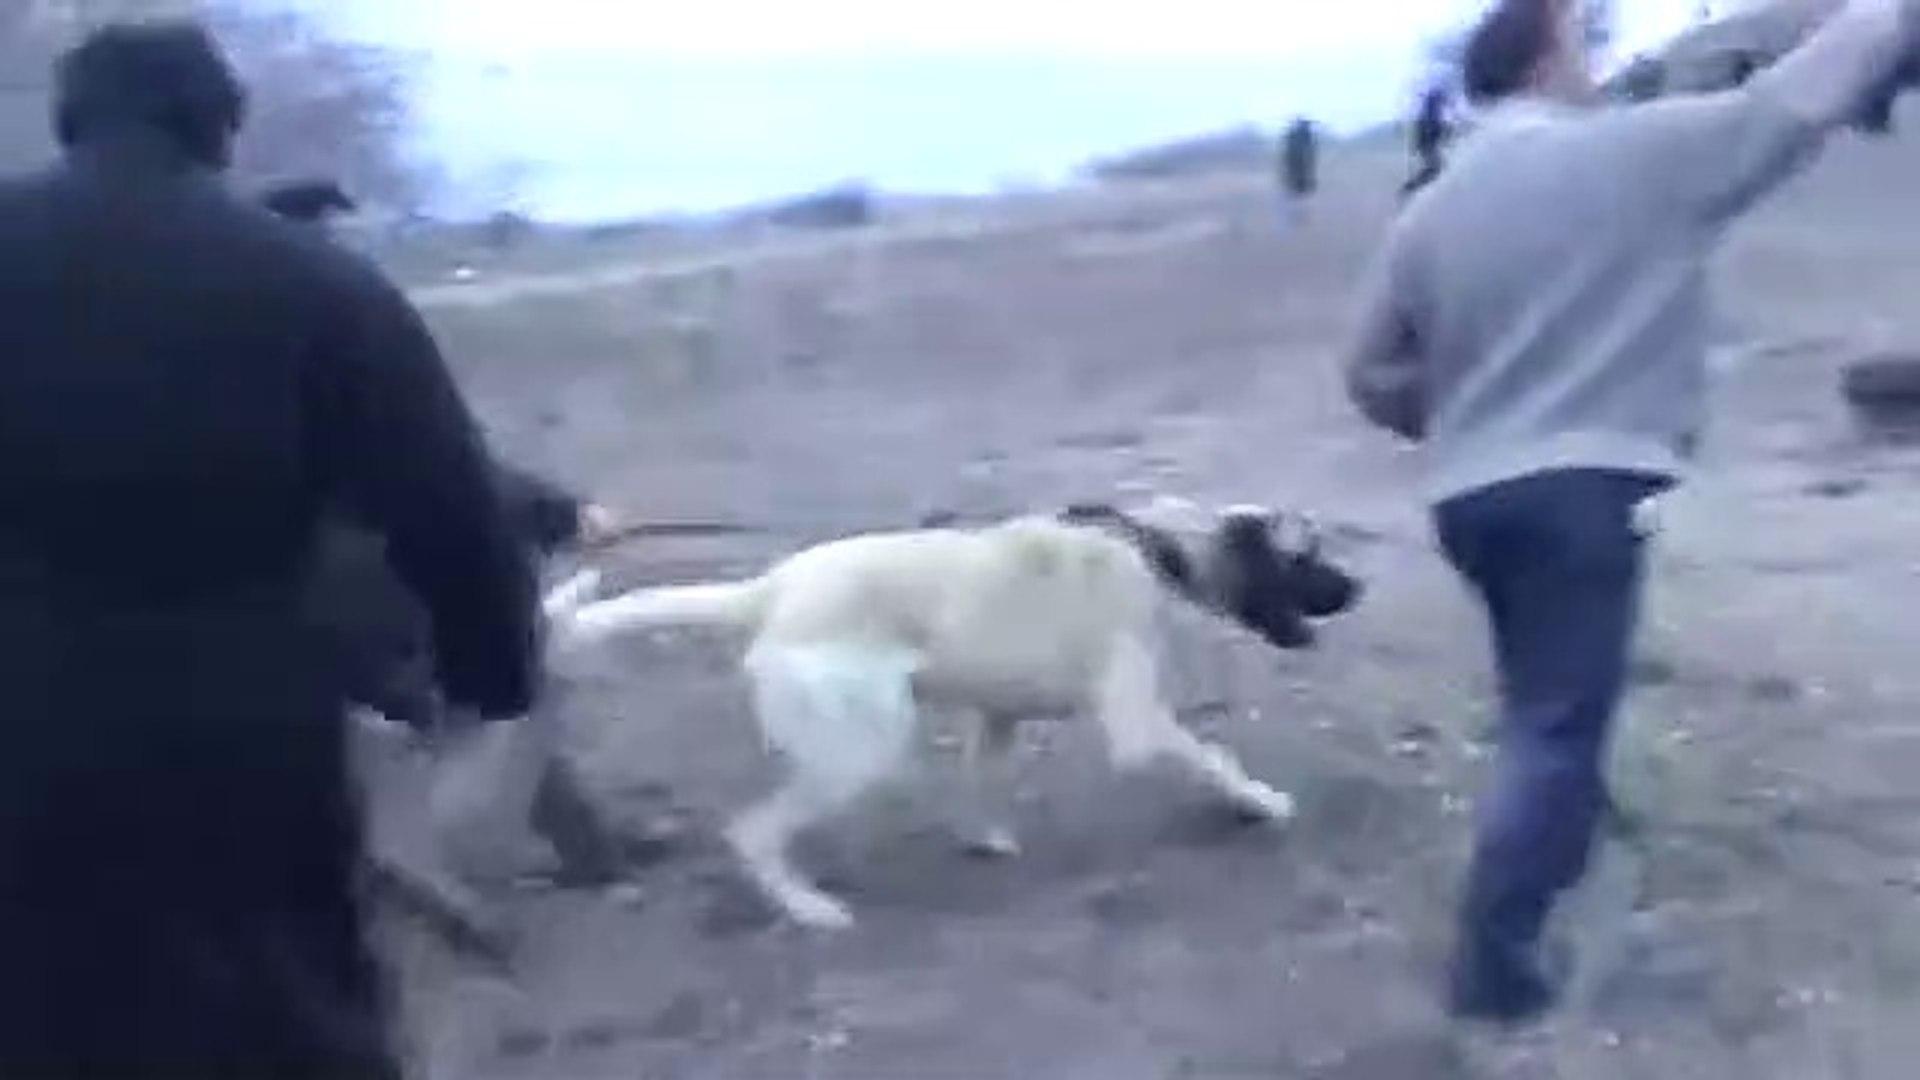 YUKSEK AKSARAY MALAKLI KOPEGi - ANATOLiAN SHEPHERD DOG MALAKLI